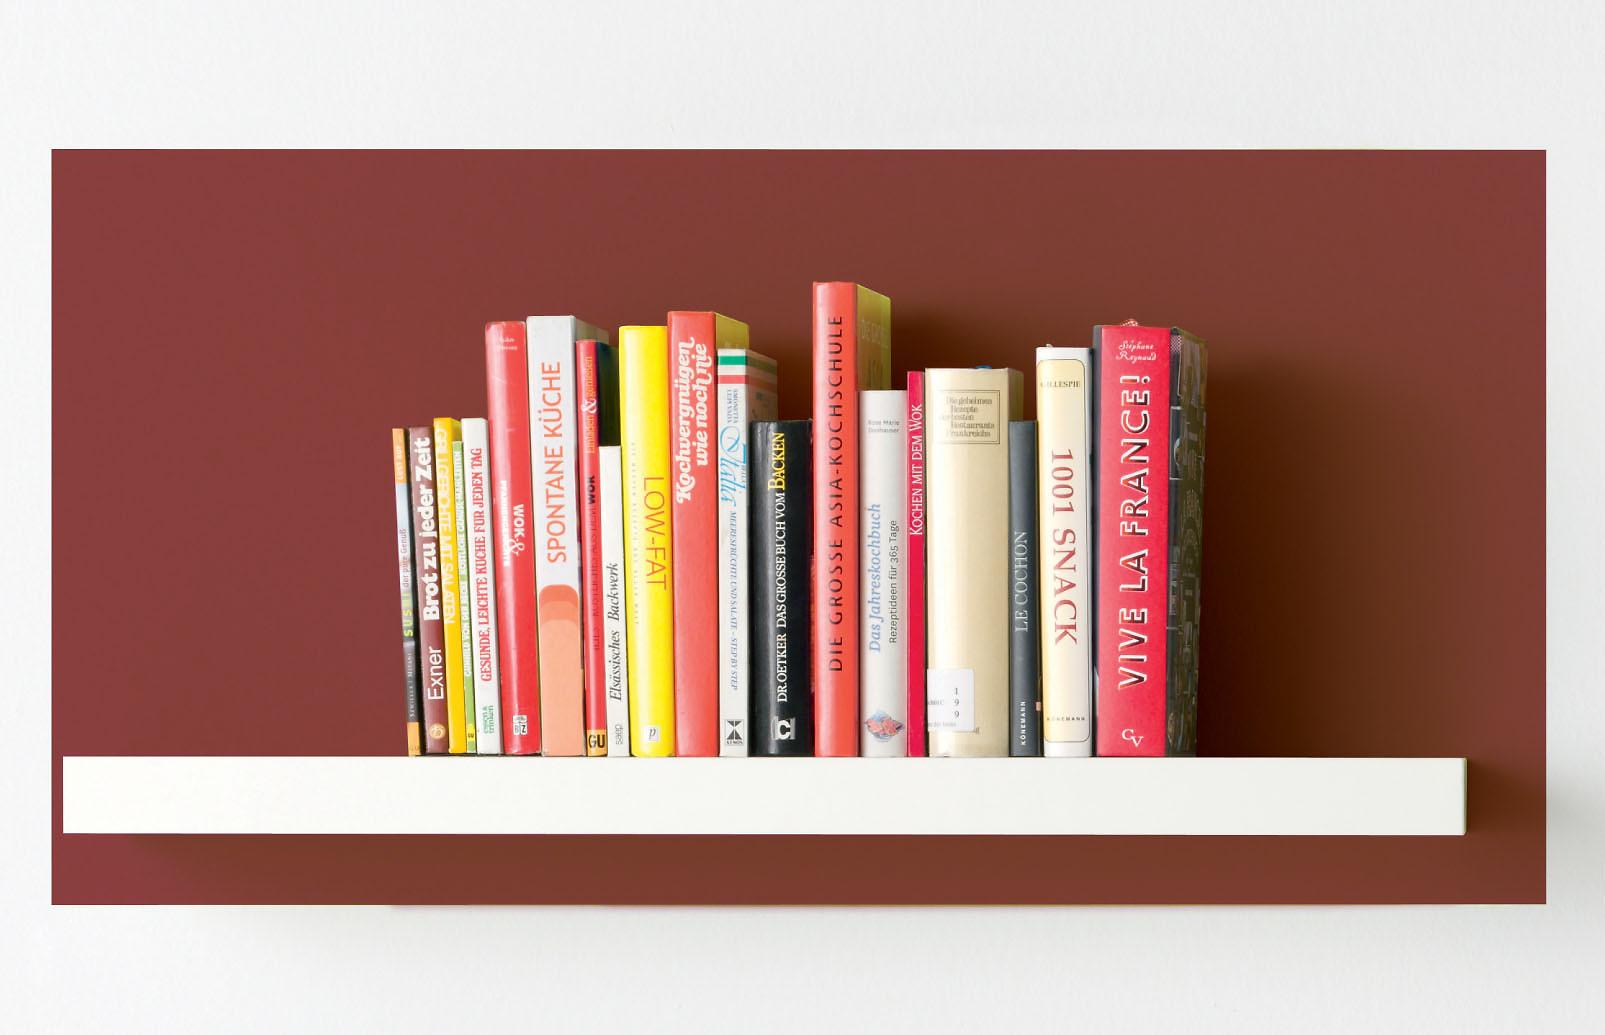 abt nfarbe farbe selber mischen rot terrakotta alpina spicy red alpina farben. Black Bedroom Furniture Sets. Home Design Ideas